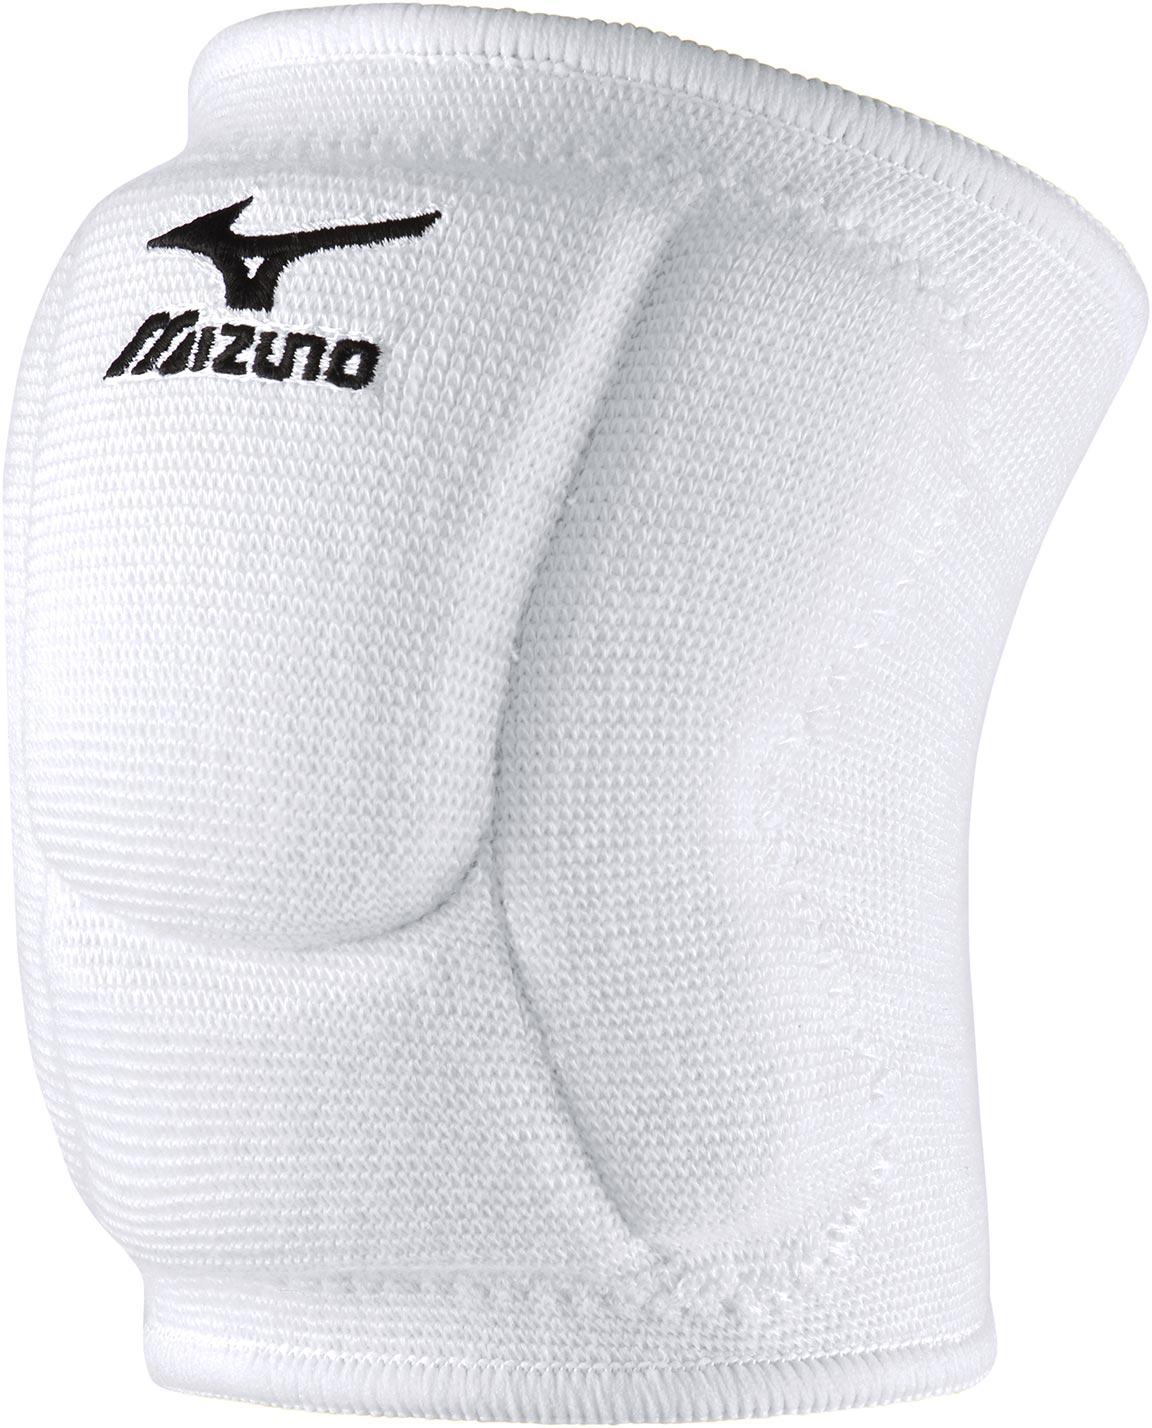 Mizuno VS1 Compact kneepad L